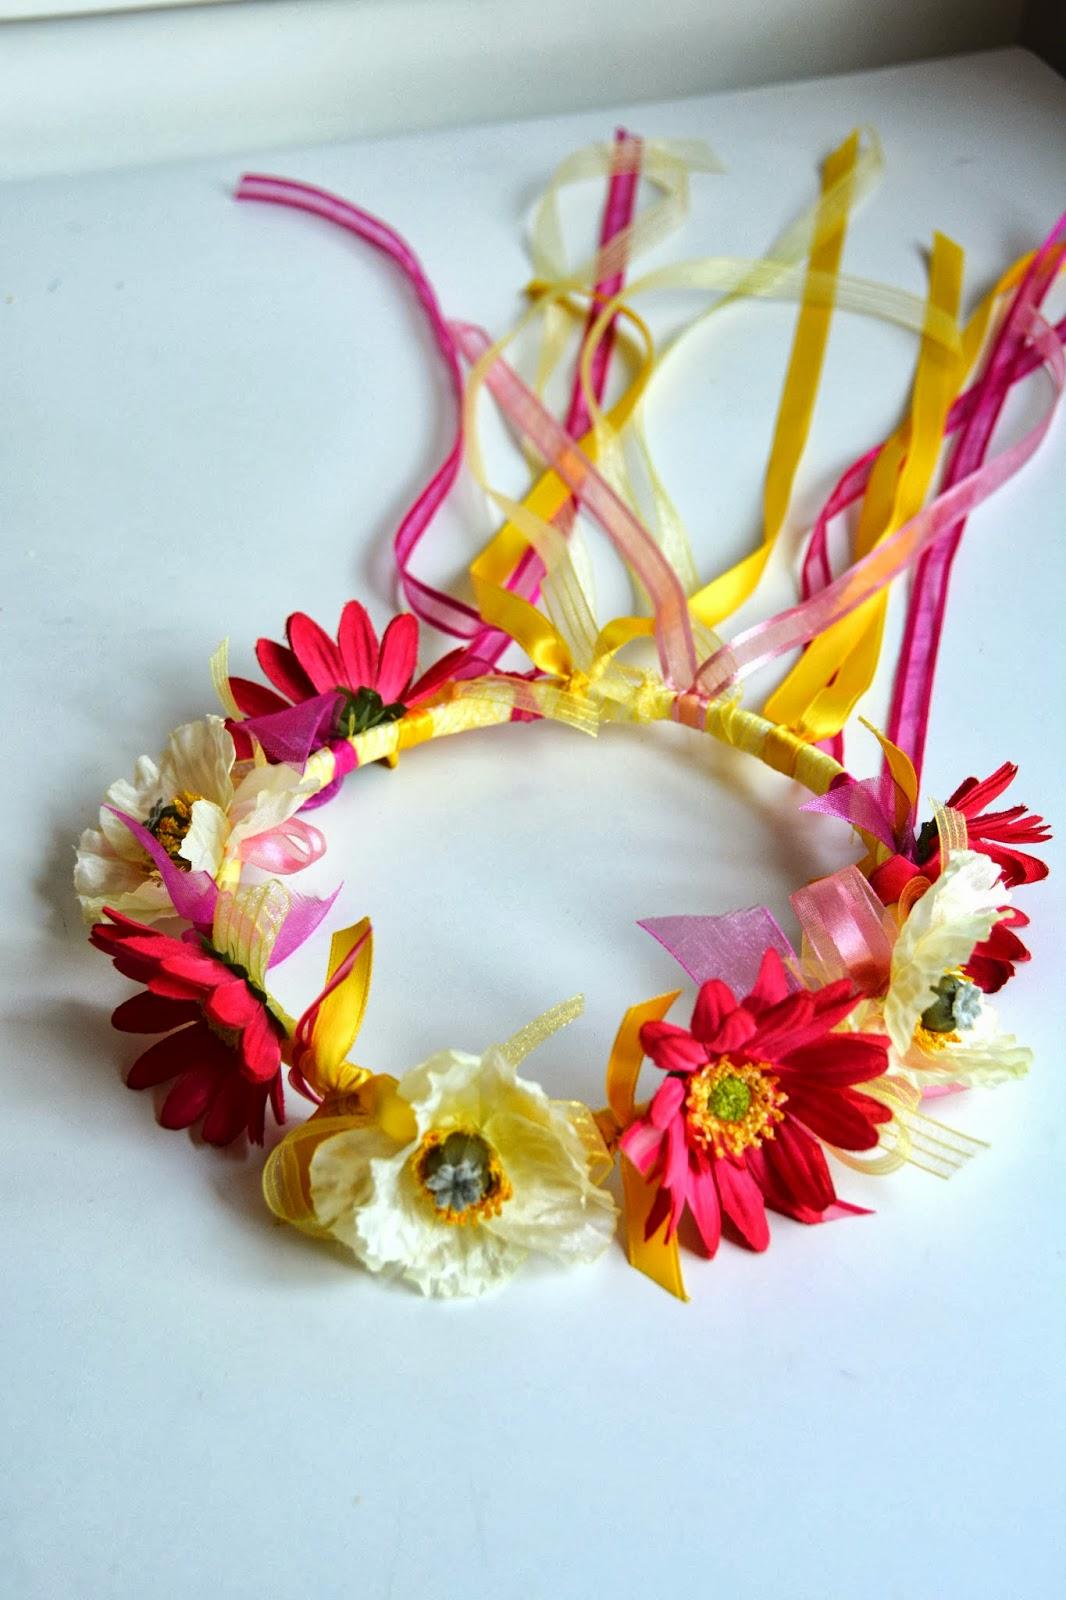 How To Make Satin Ribbon Crafts